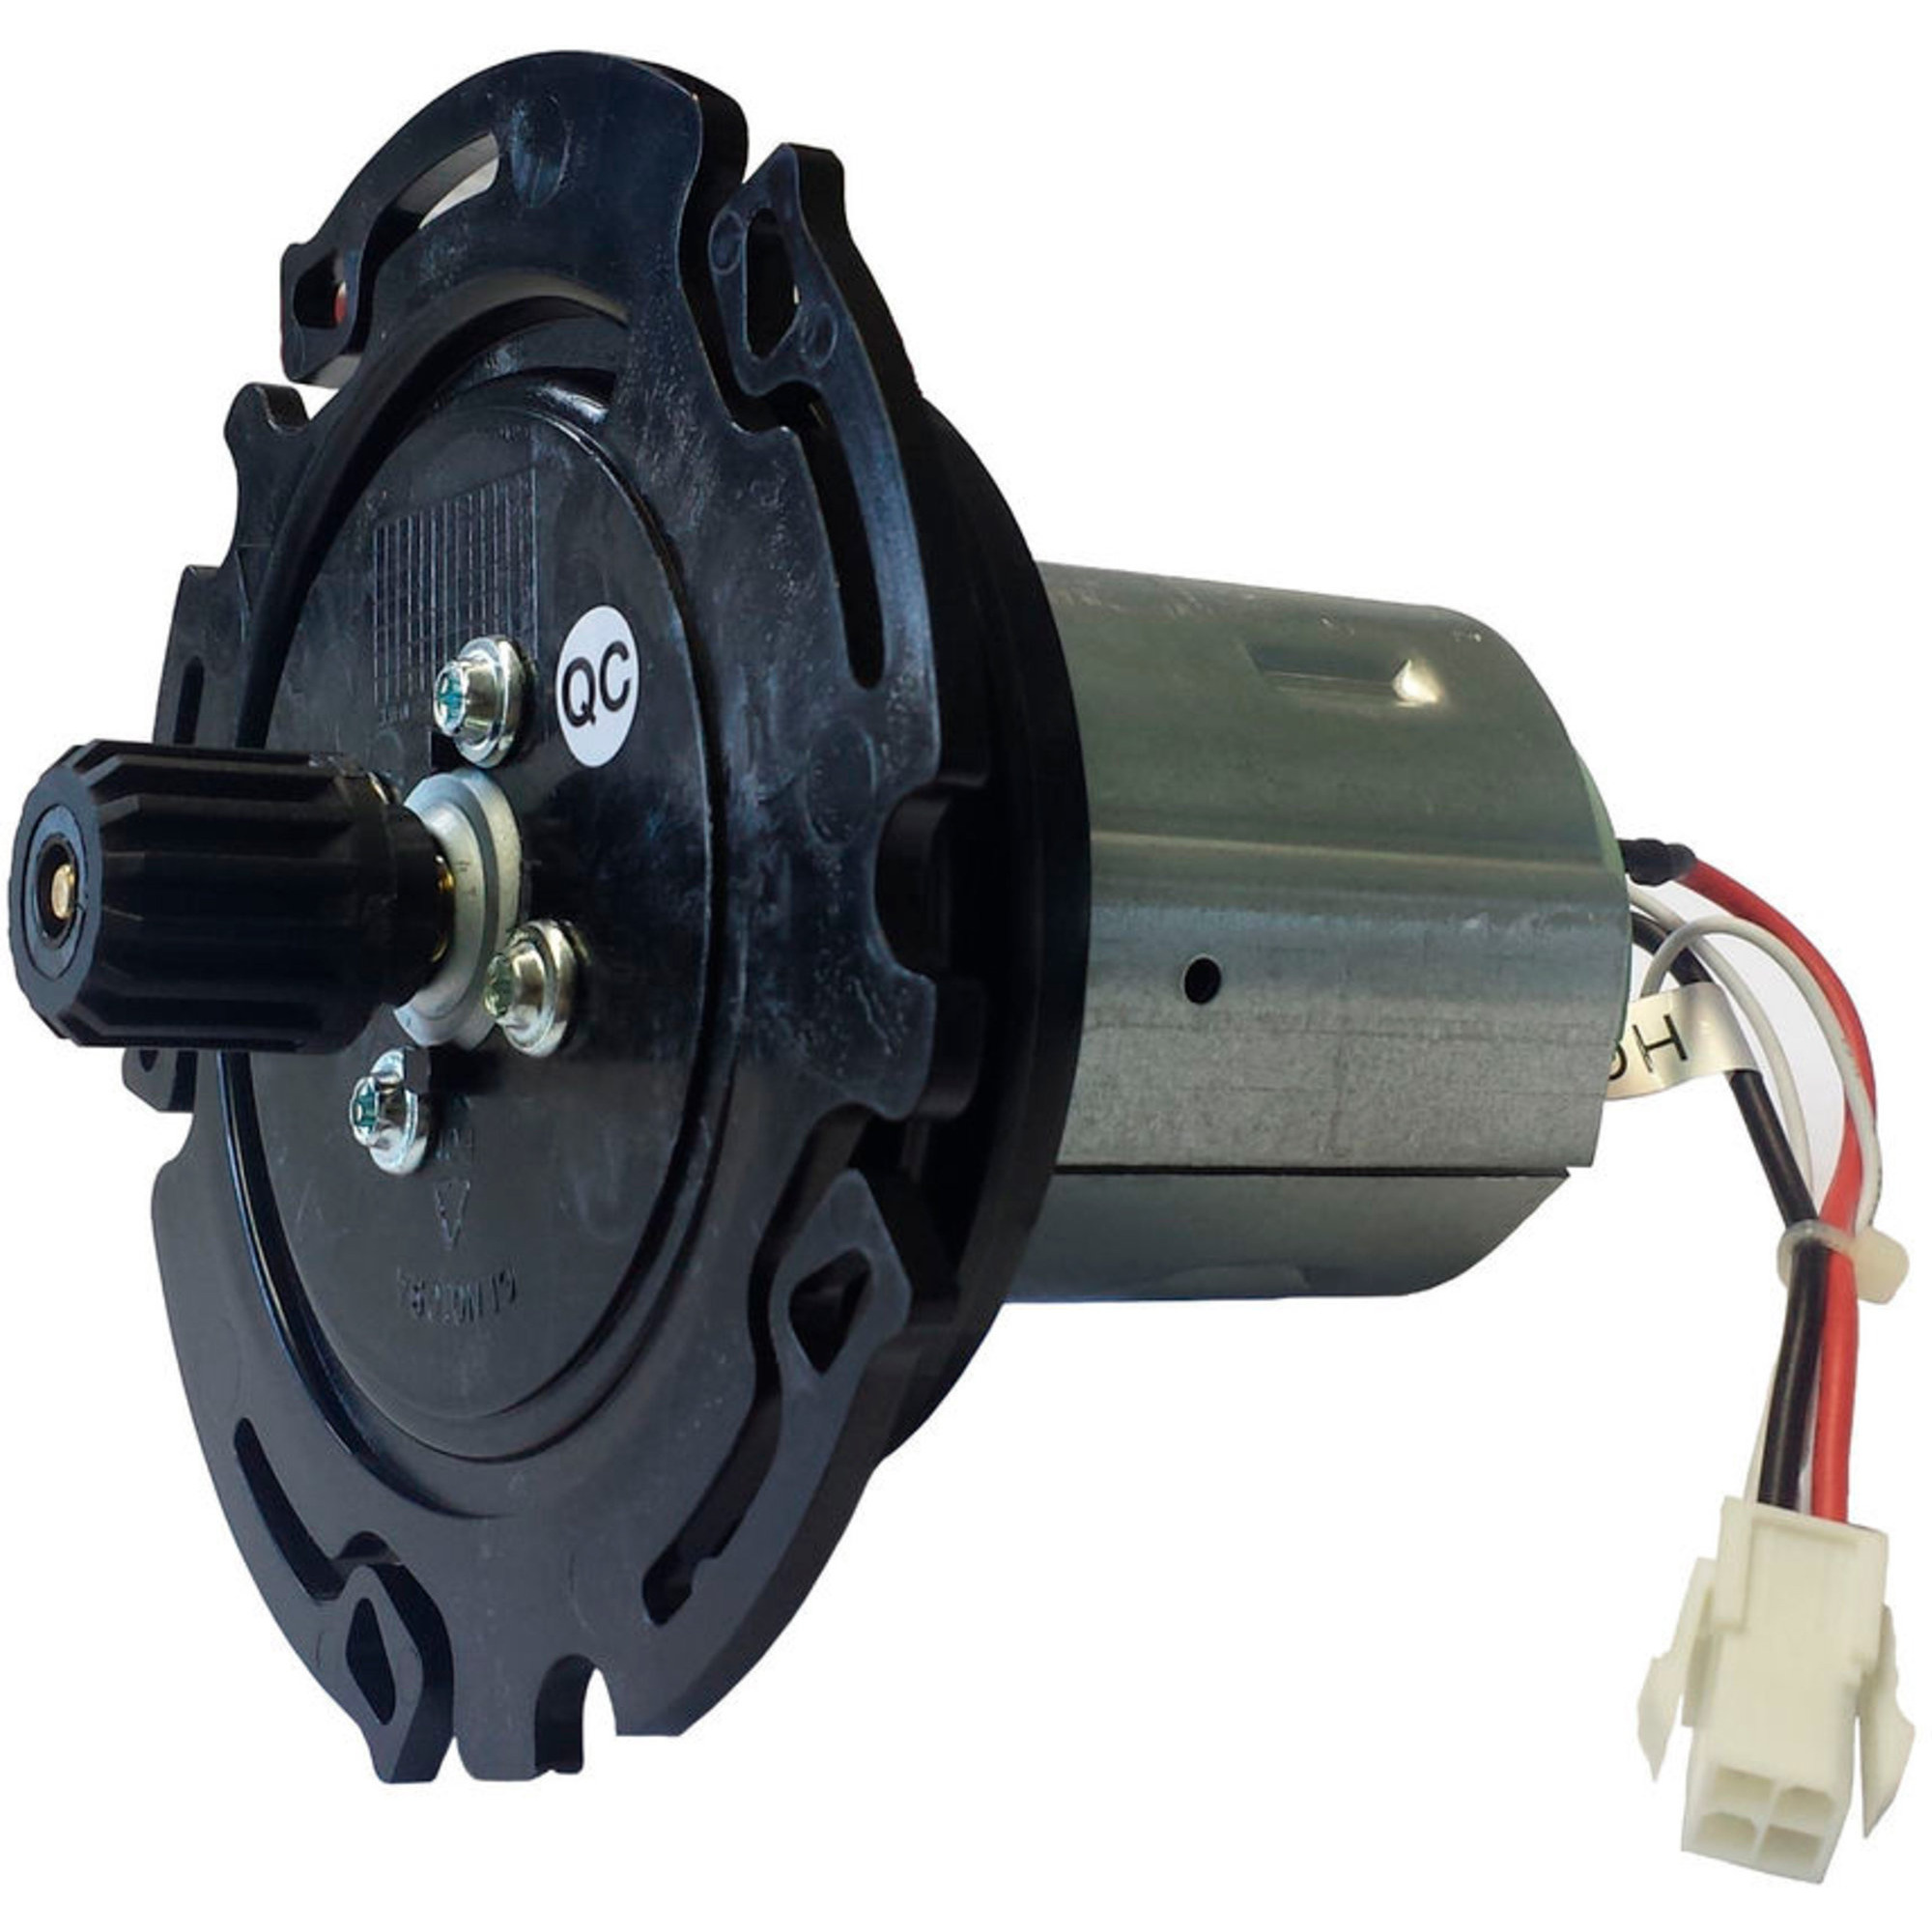 Robomow Mortor till Kniv  MSB0065C